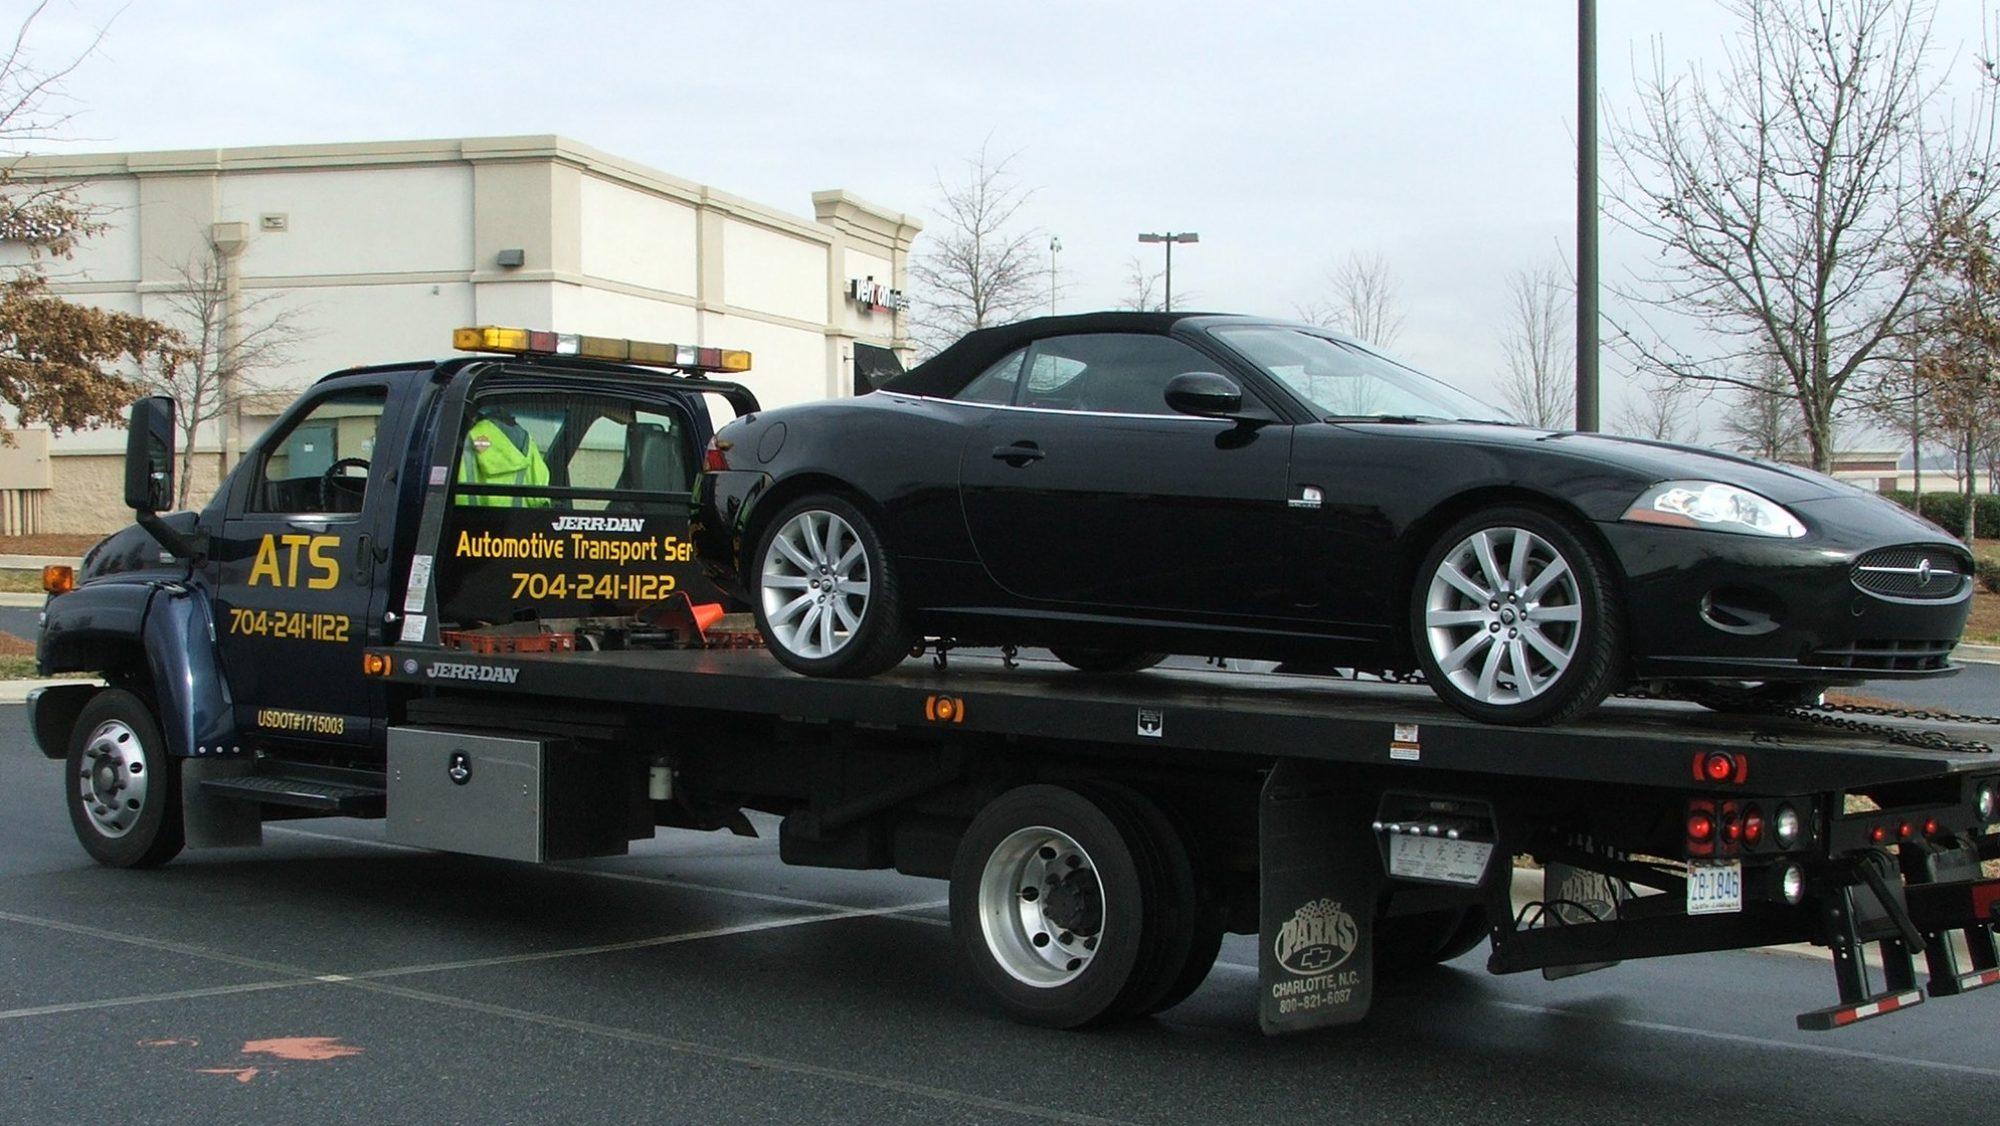 A.T.S. Automotive Transport Service